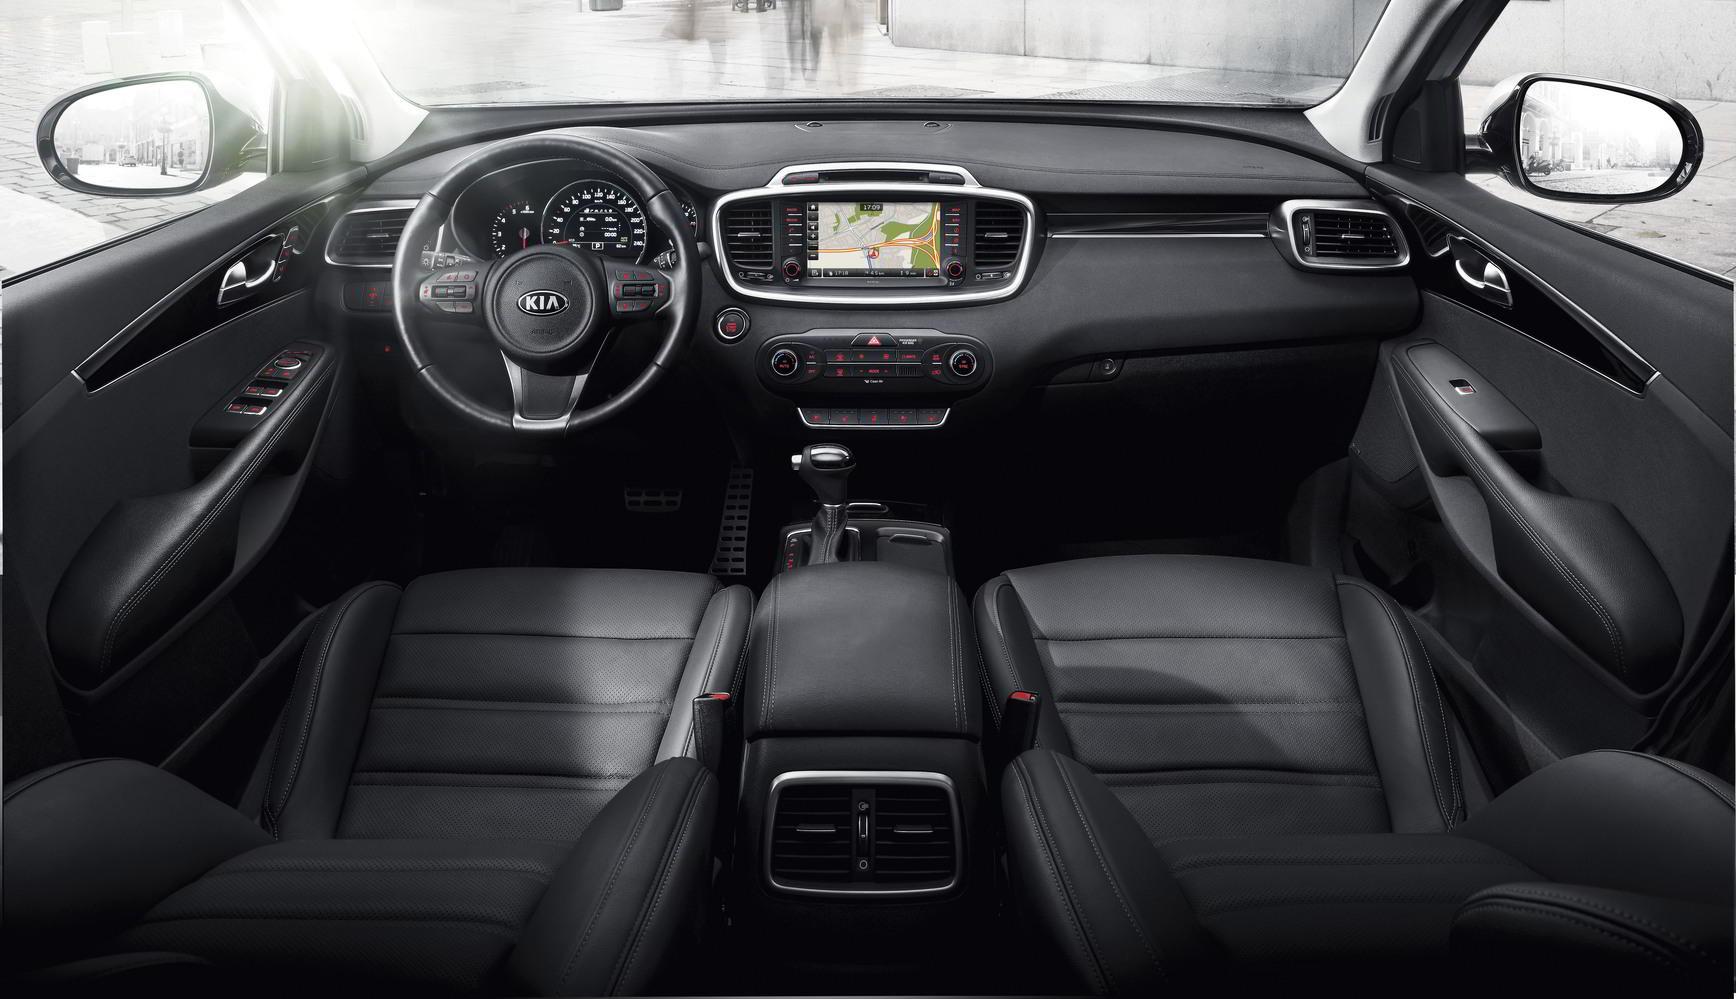 Kia Sorento Prime 2015 официальное фото интерьера